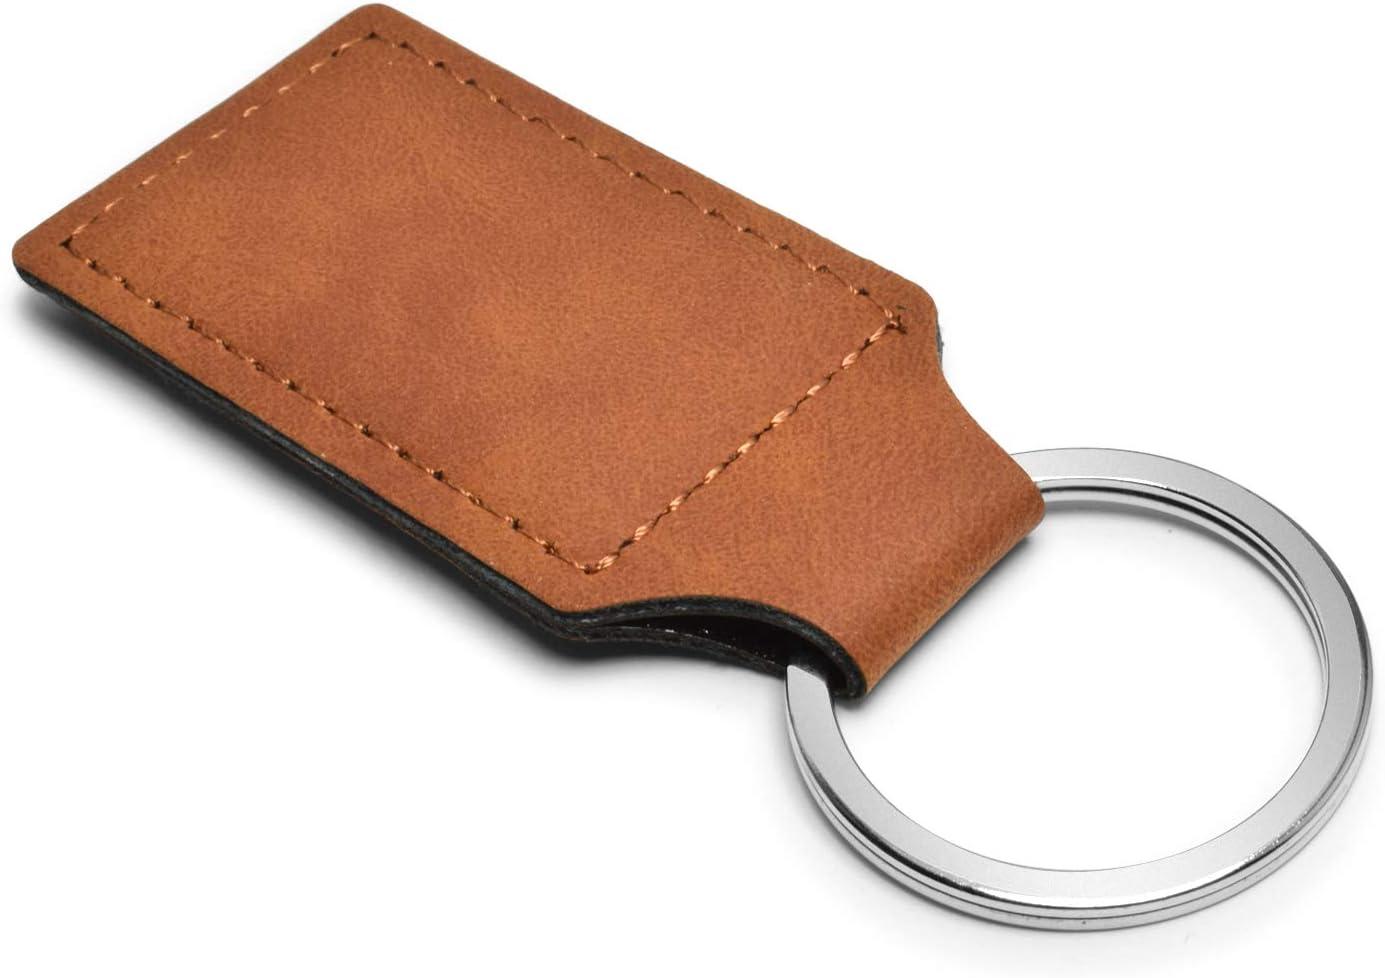 Dodge Viper Rectangular Brown Leatherette Key Chain iPick Image for